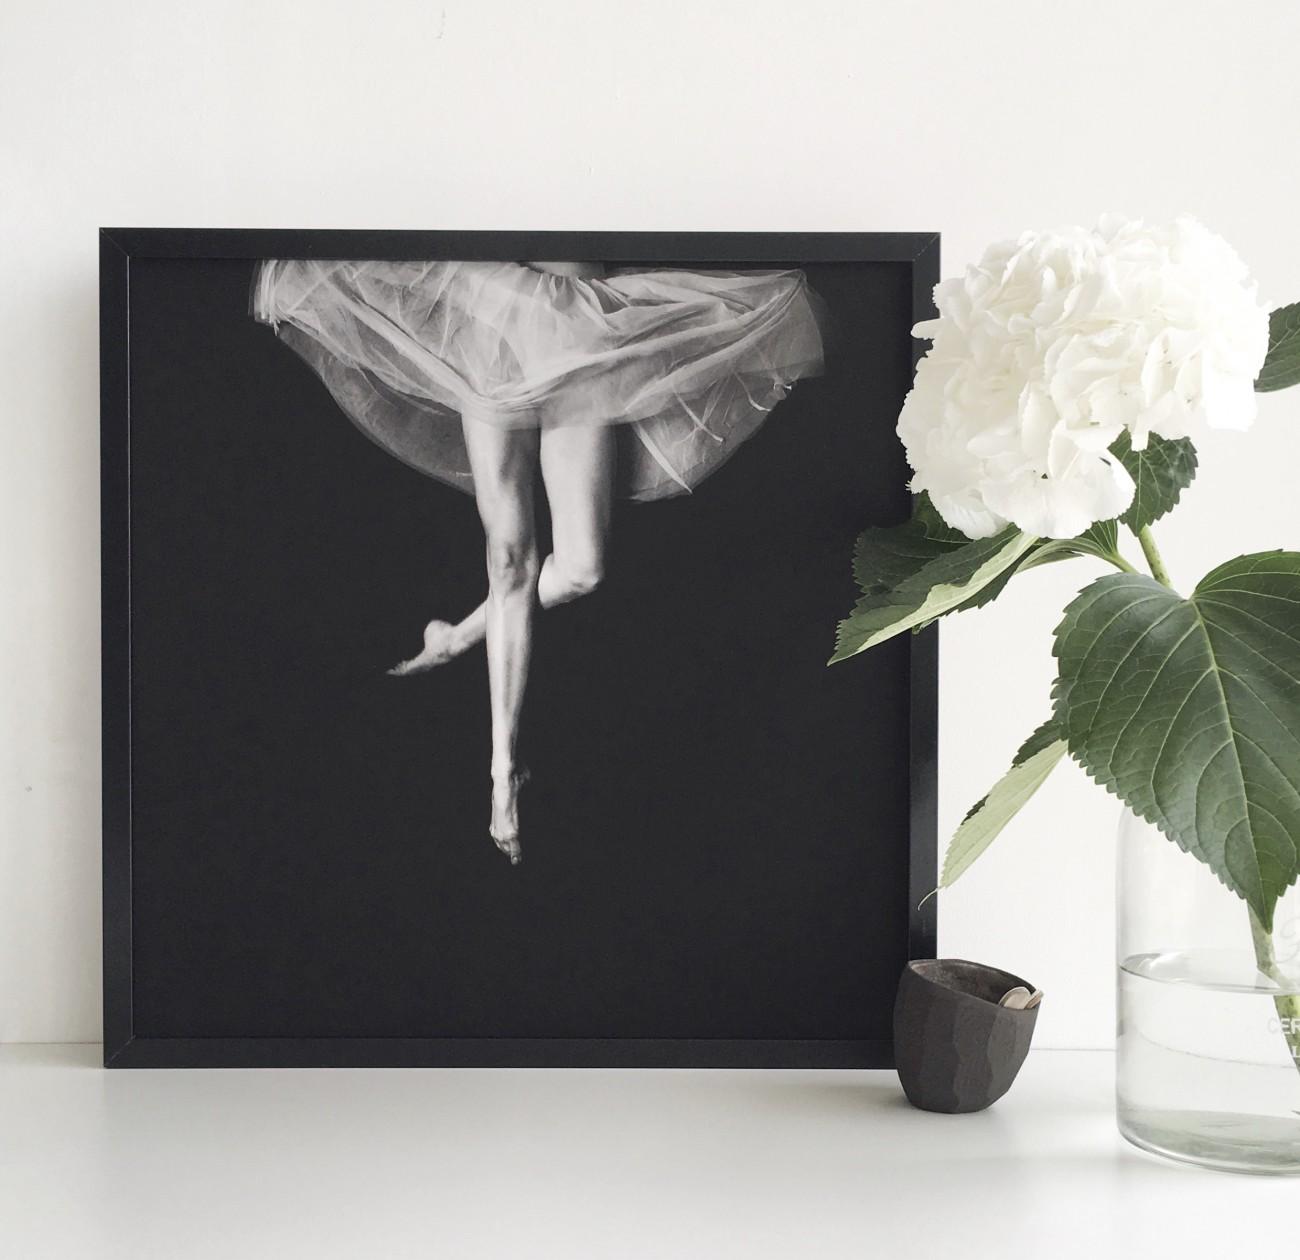 One of Soo-UK's beautiful ballet series